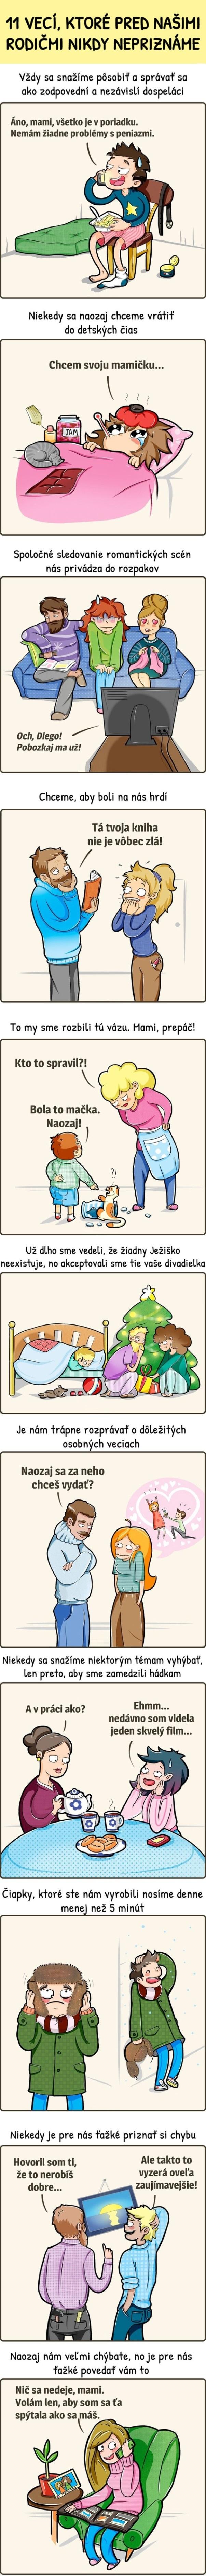 rodicmi